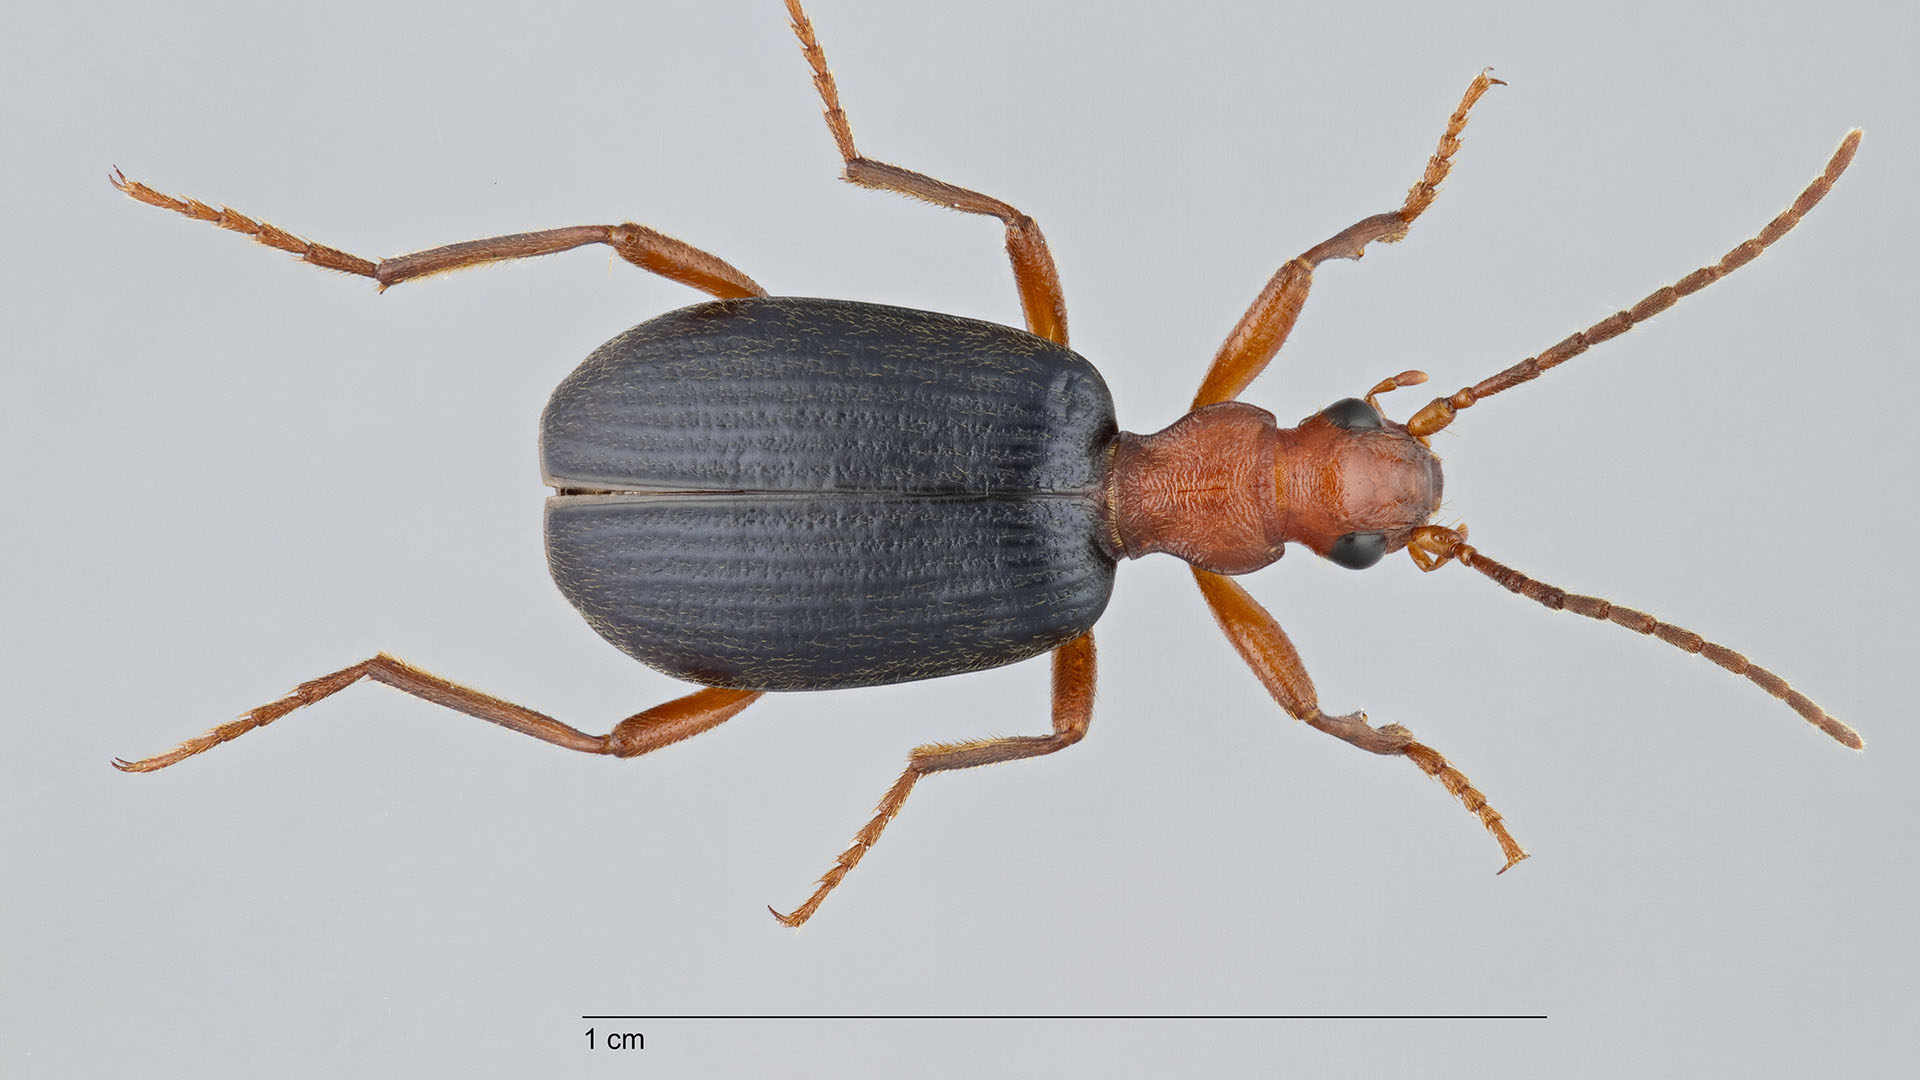 Bombardier beetle (Brachinus elonatulus) dorsal view.